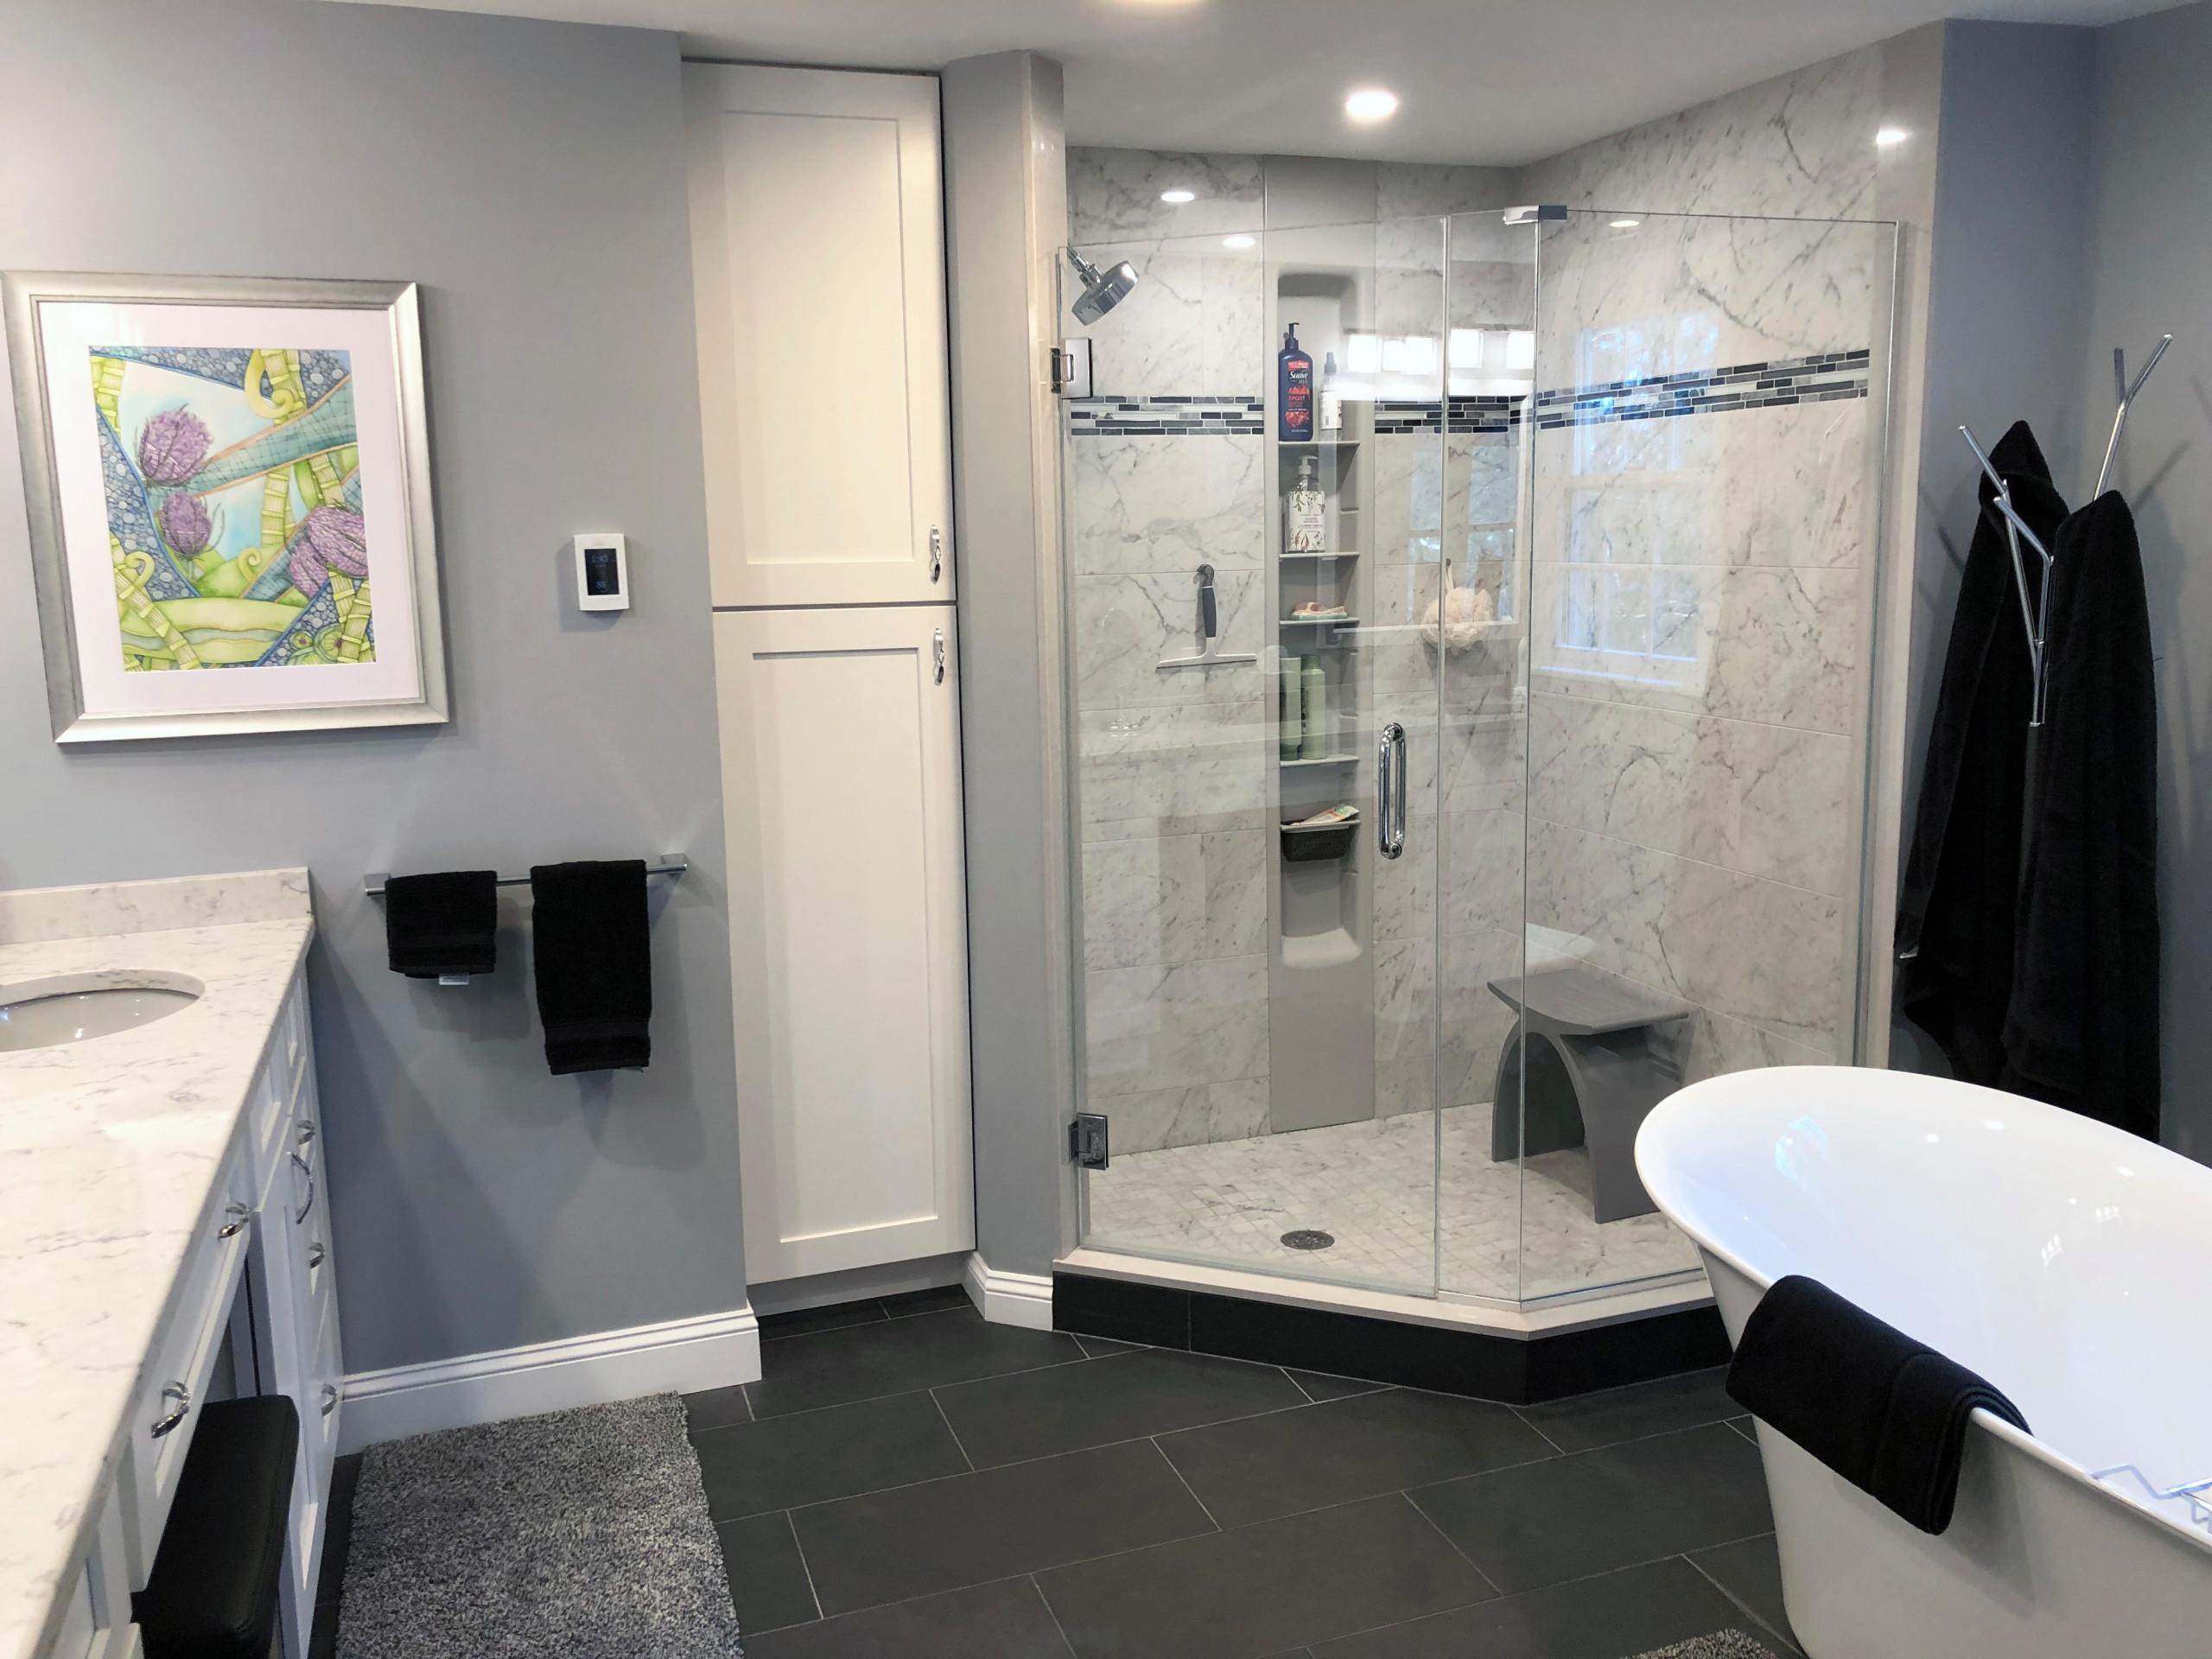 Marshfield Bathroom Remodel